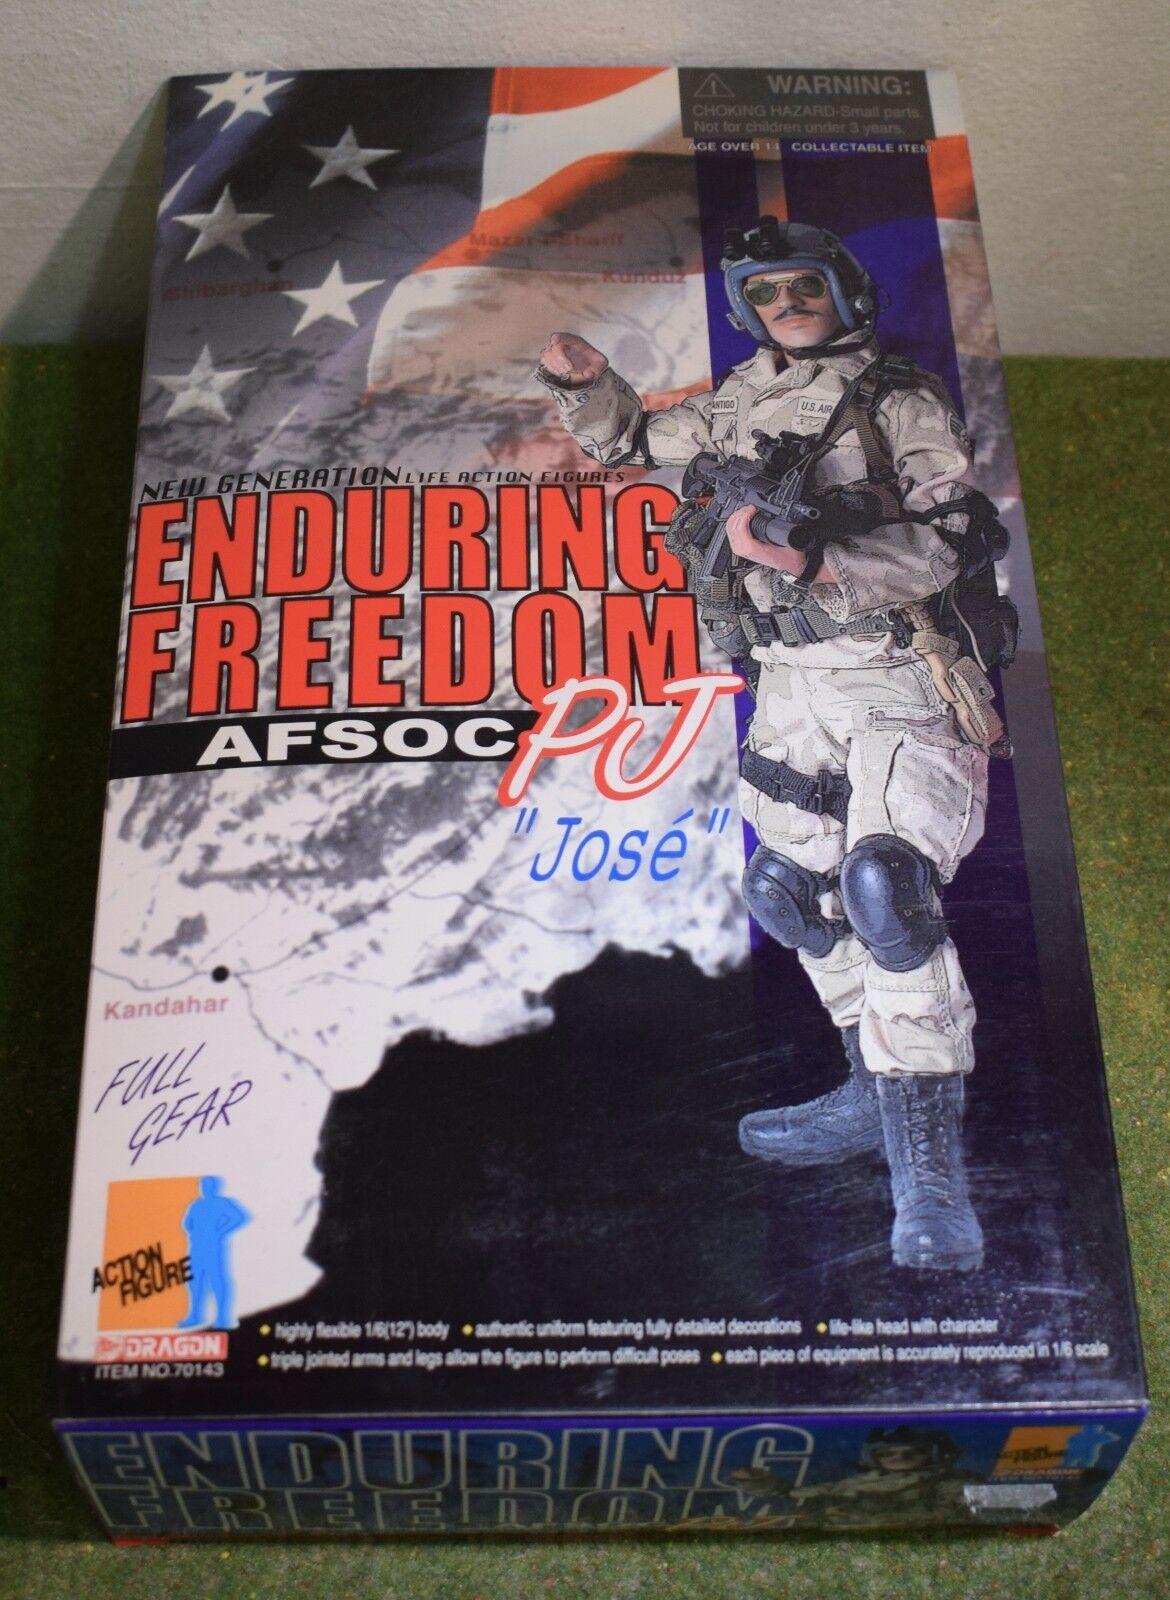 DRAGON 1 6 SCALE MODERN US PJ JOSE 70143 AFSOC ENDURING FREEDOM